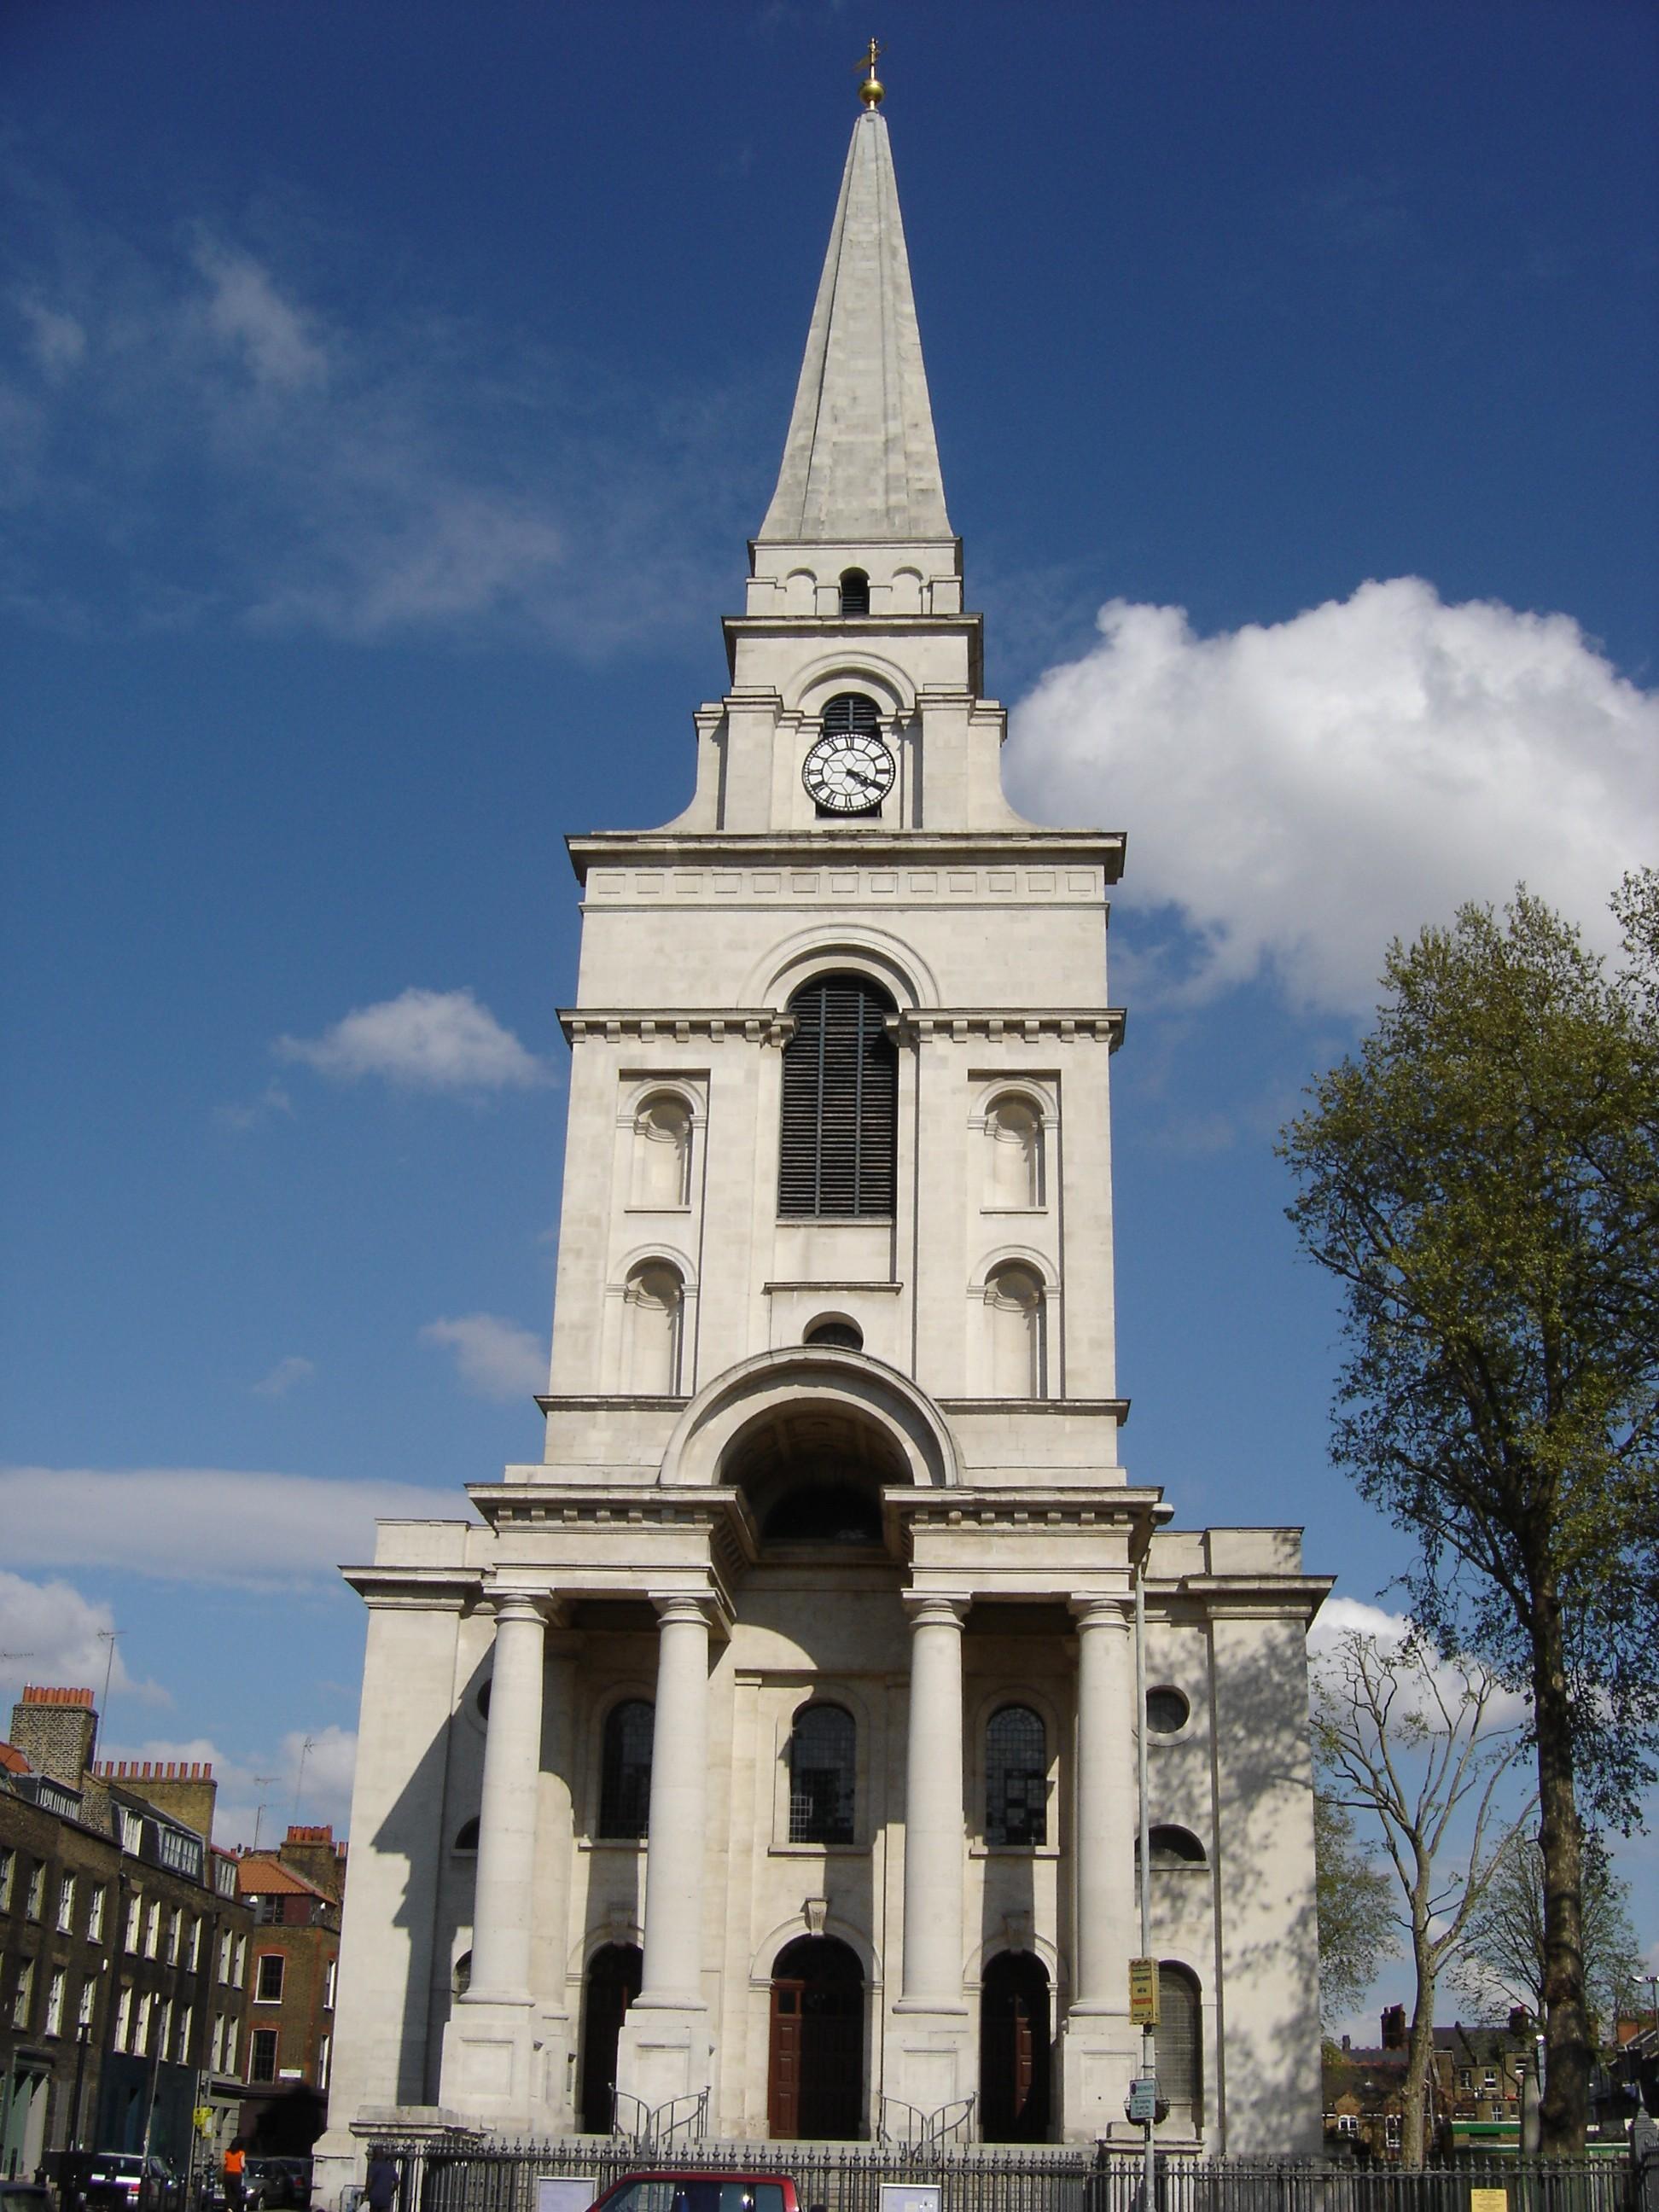 Spitalfields London: Spitalfields, Christ Church